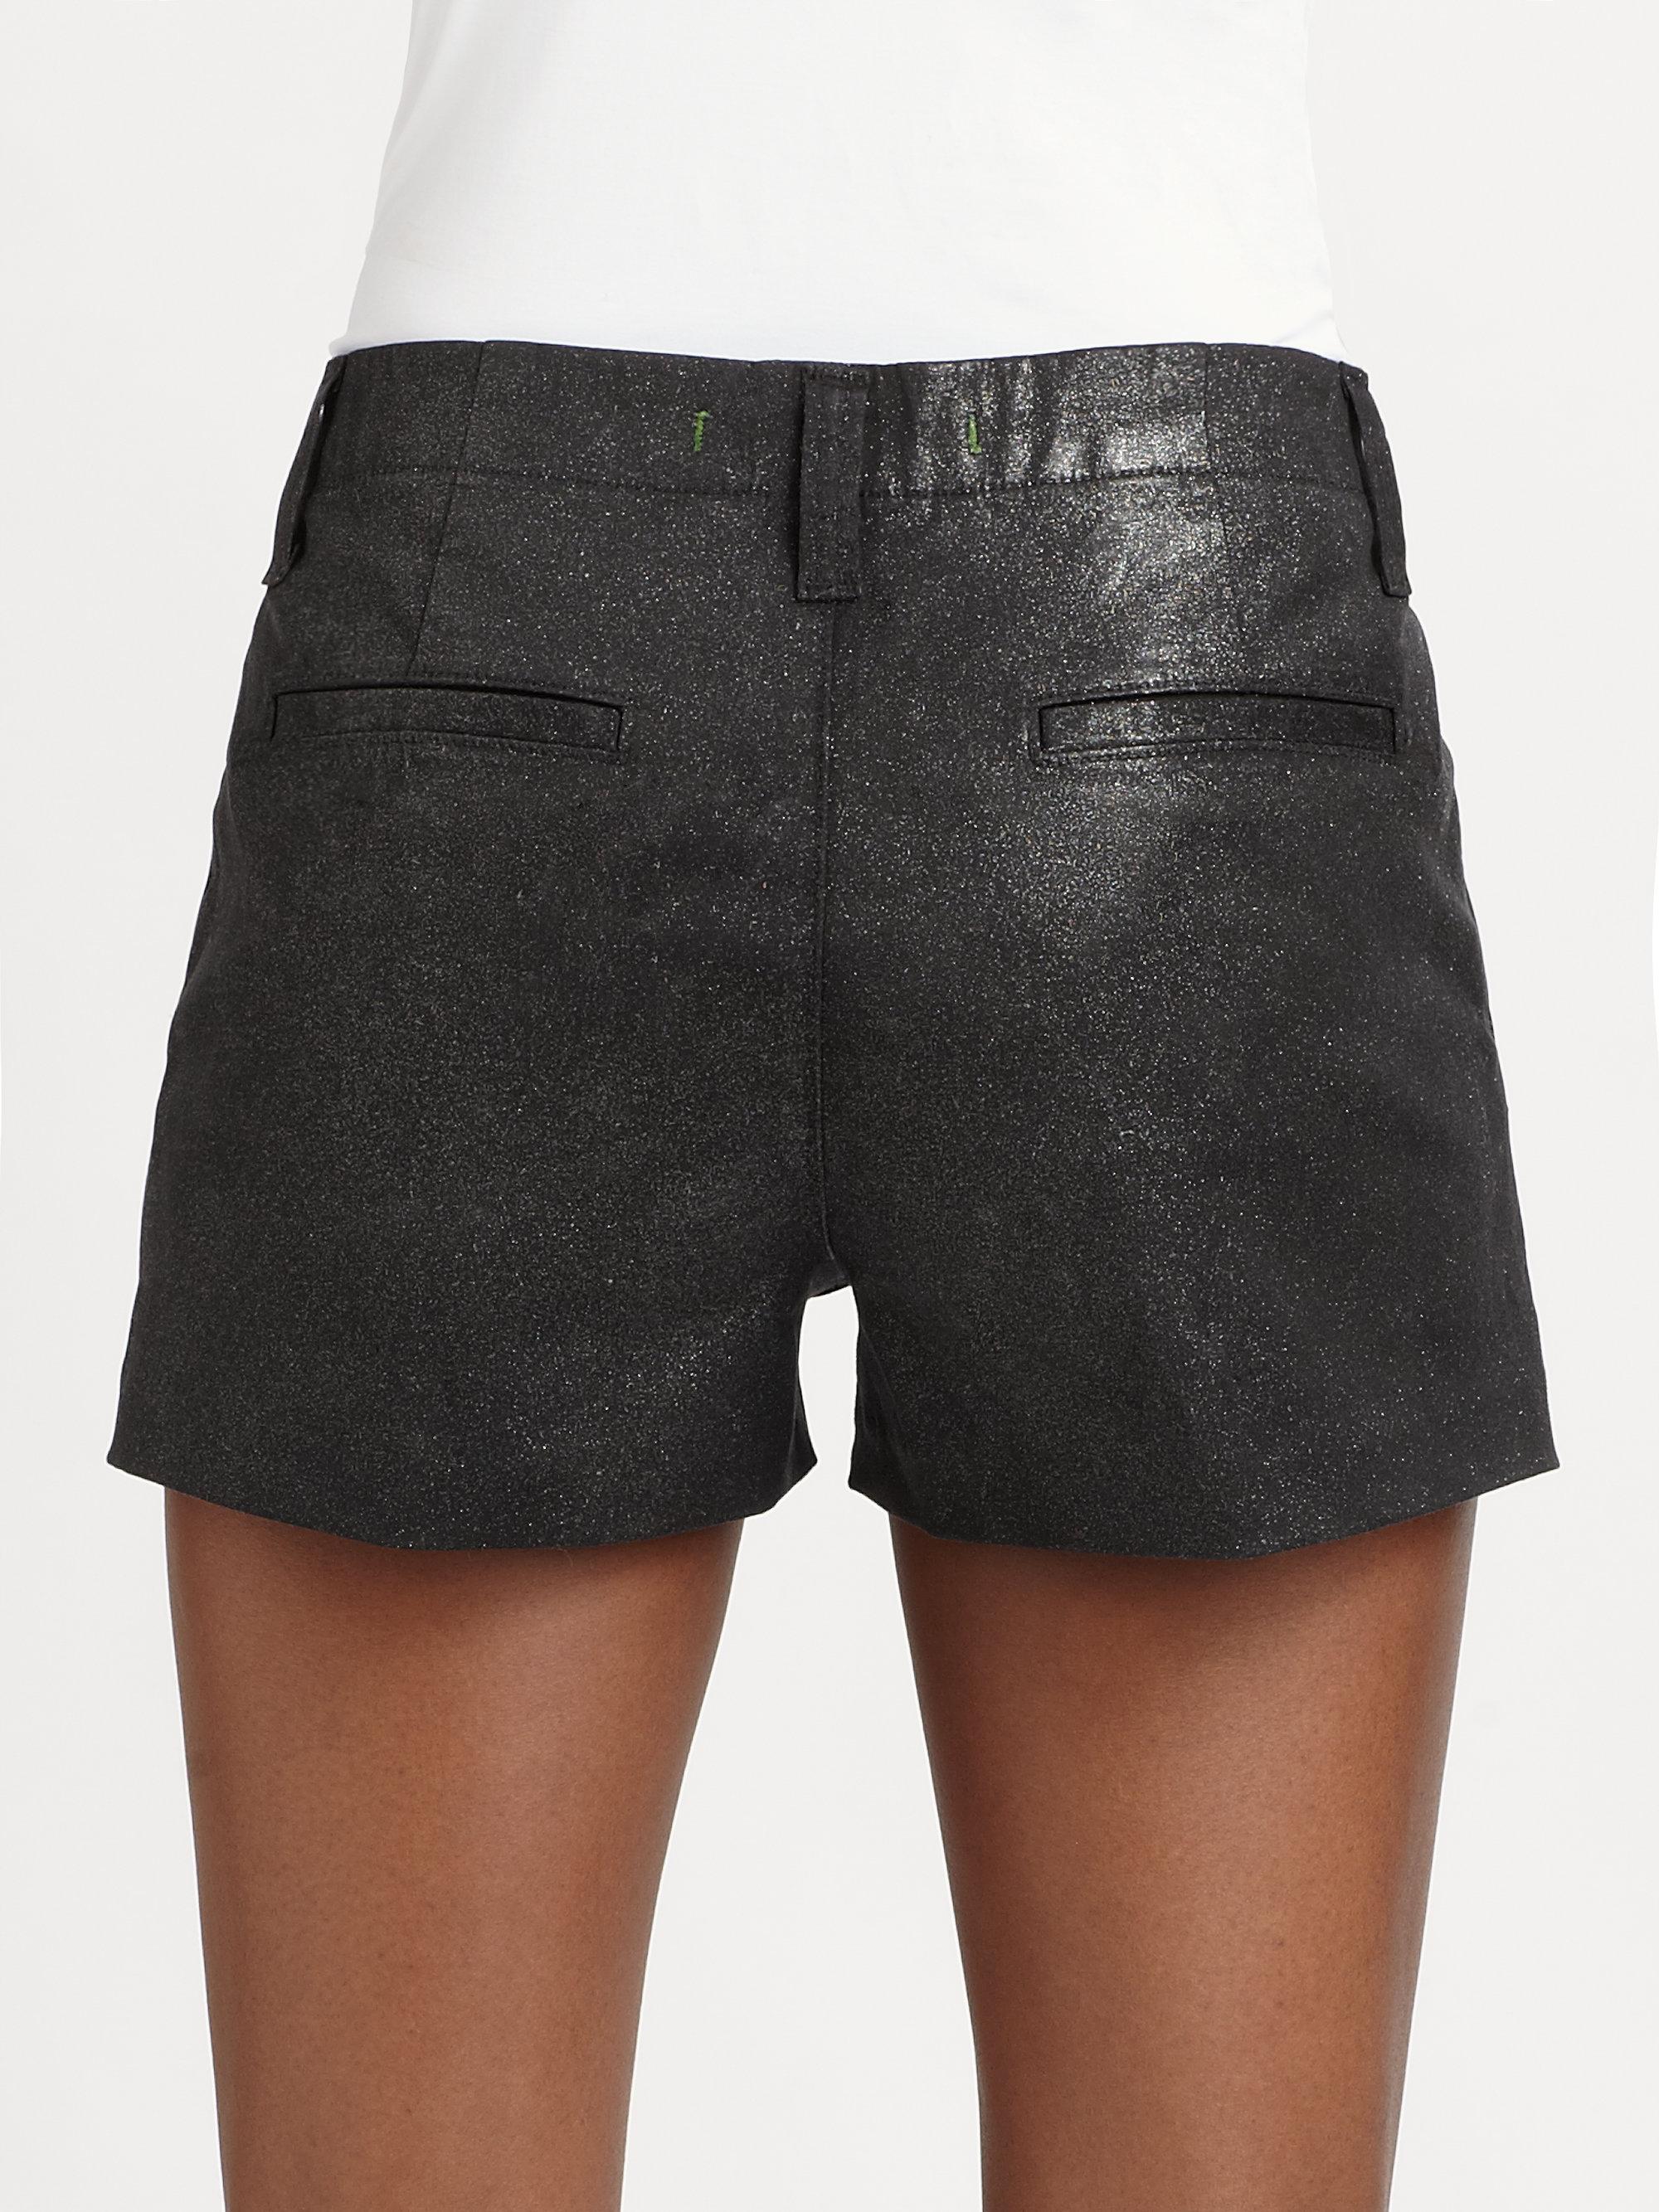 J brand Lola Highrise Coated Denim Shorts in Black | Lyst